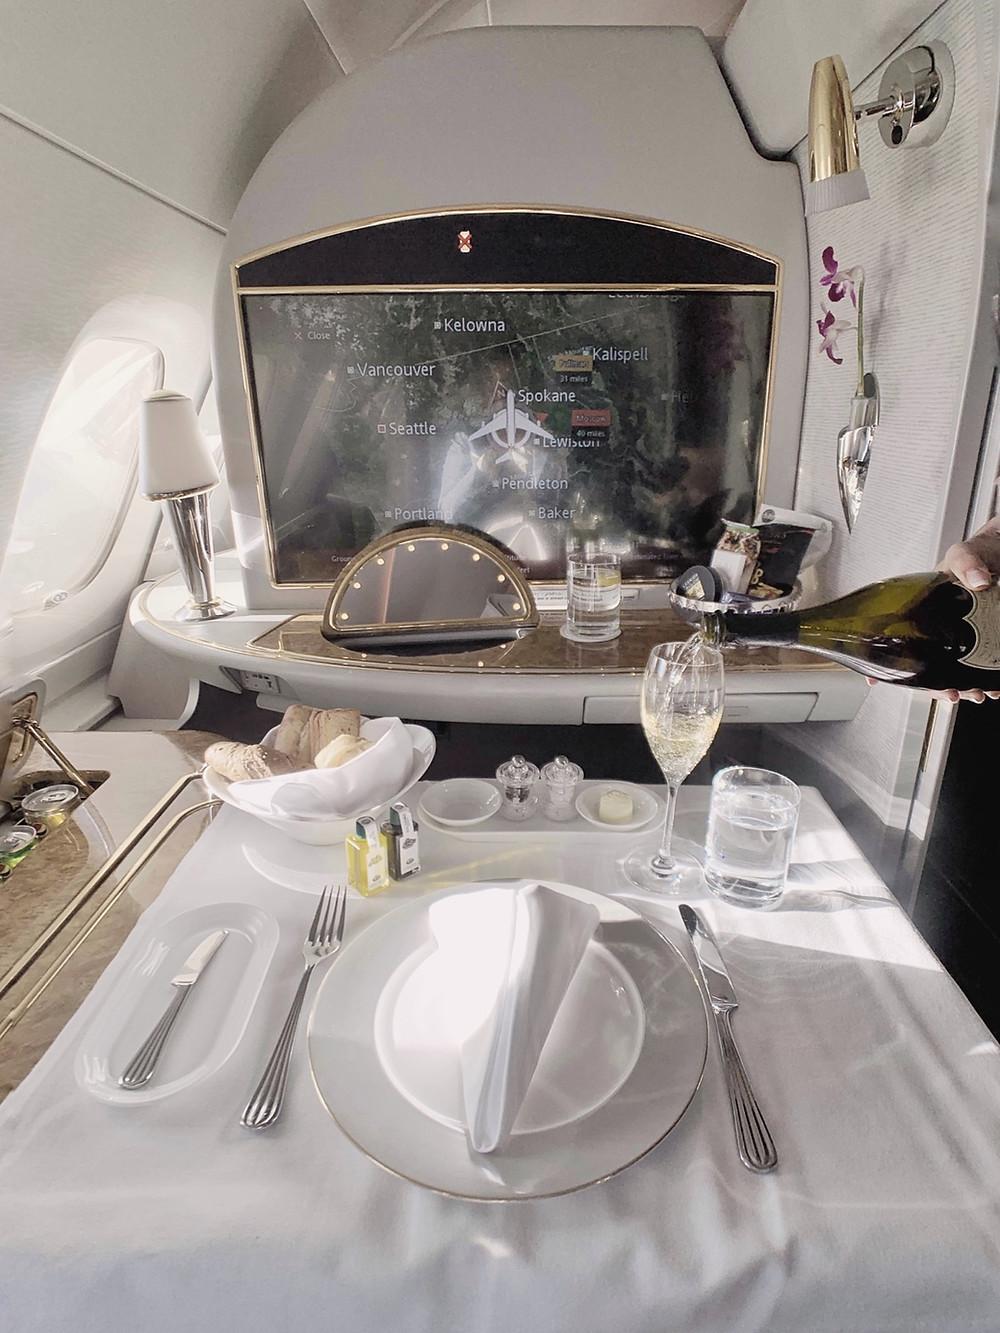 Emirates First Class San Francisco - Dubai, Table Setting